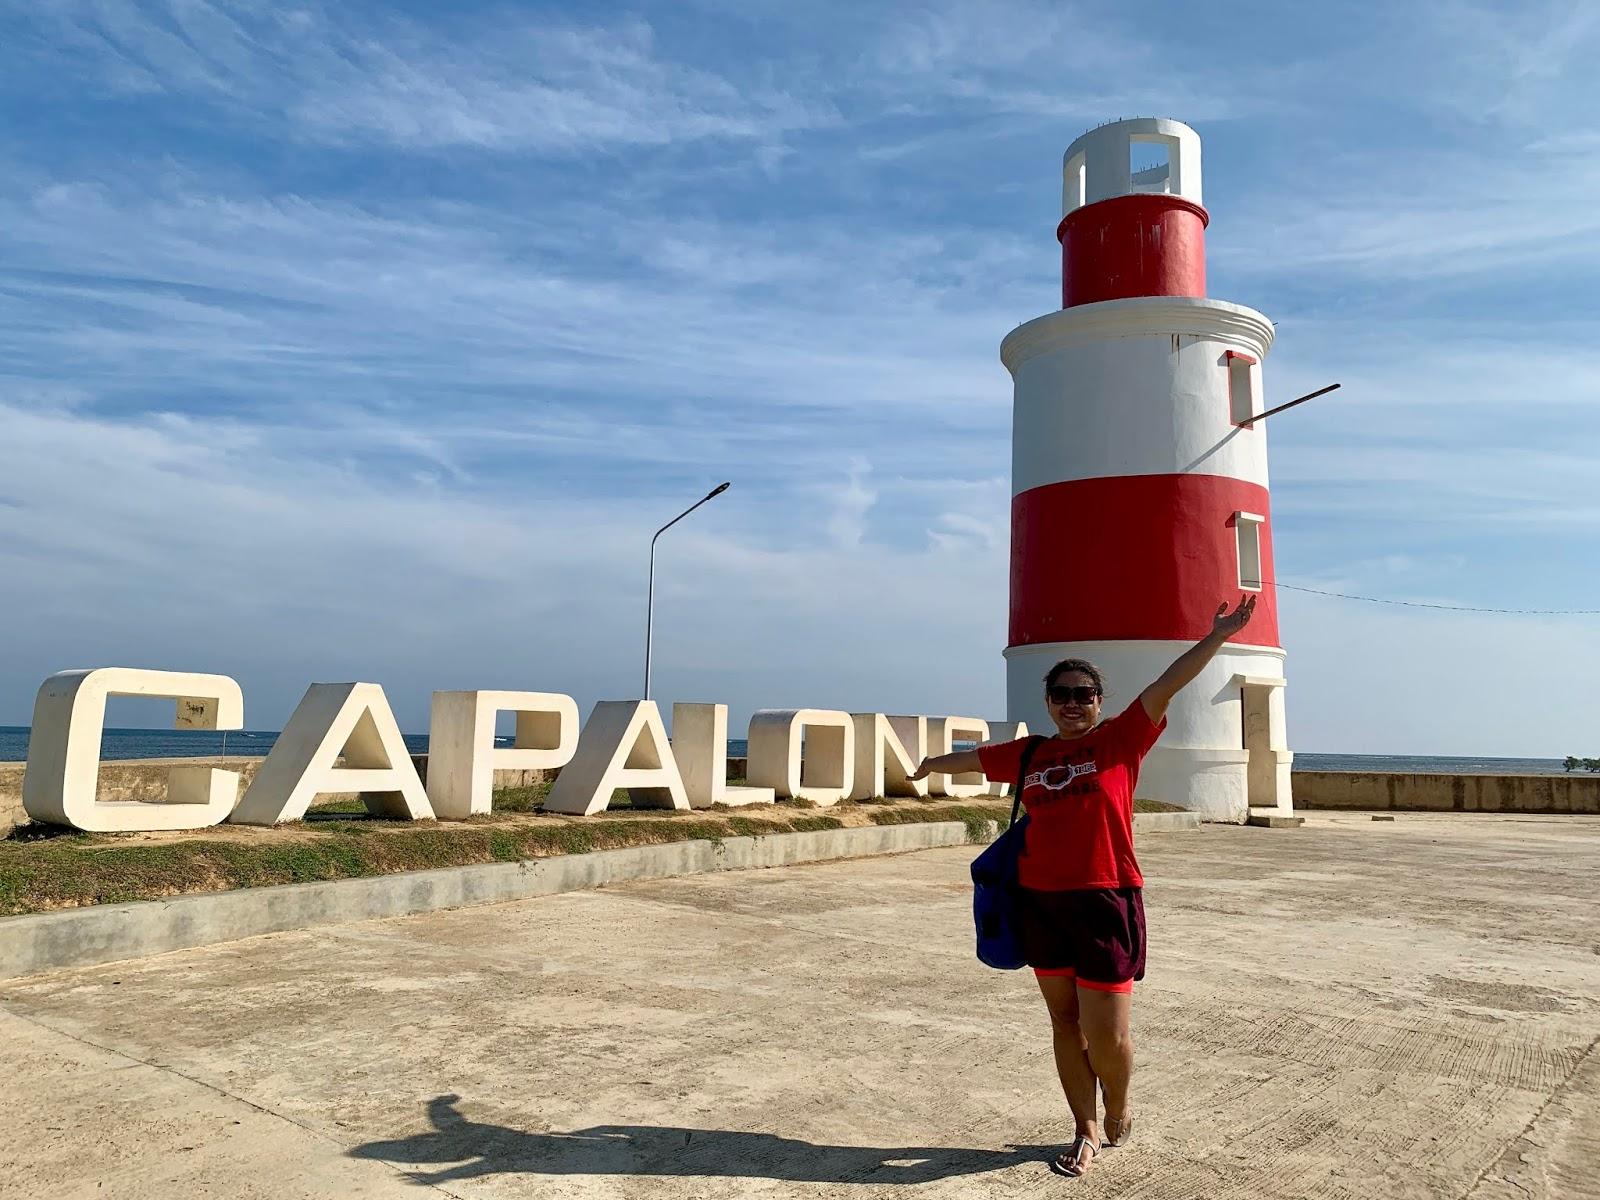 Capalonga Sign and Lightouse